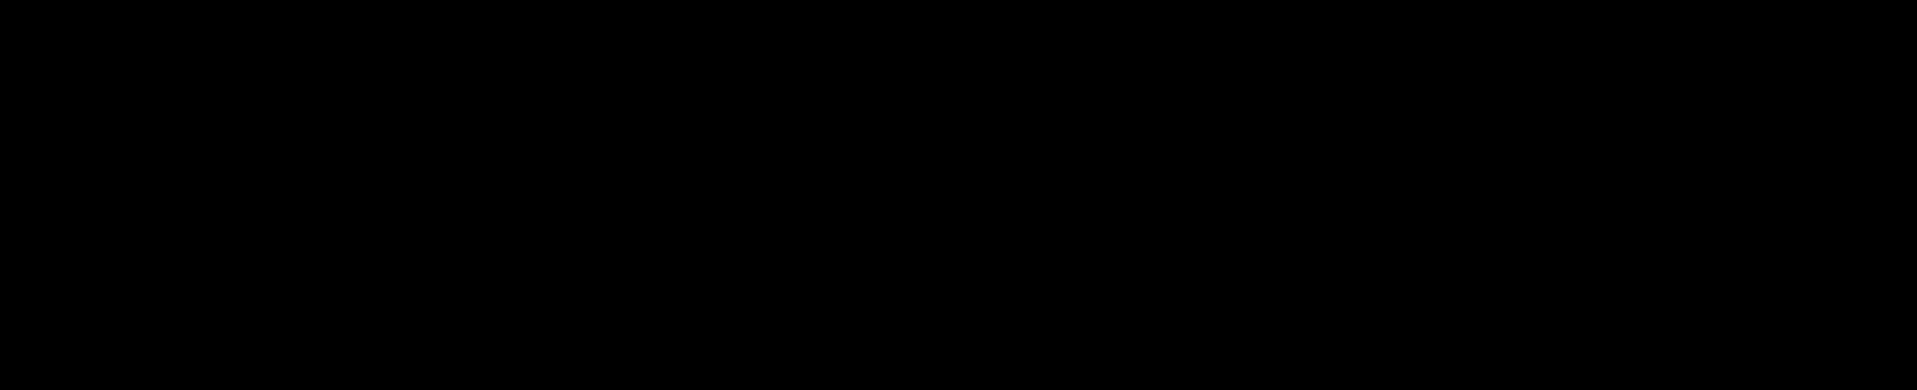 HOLAOLA_main_simple_black.png